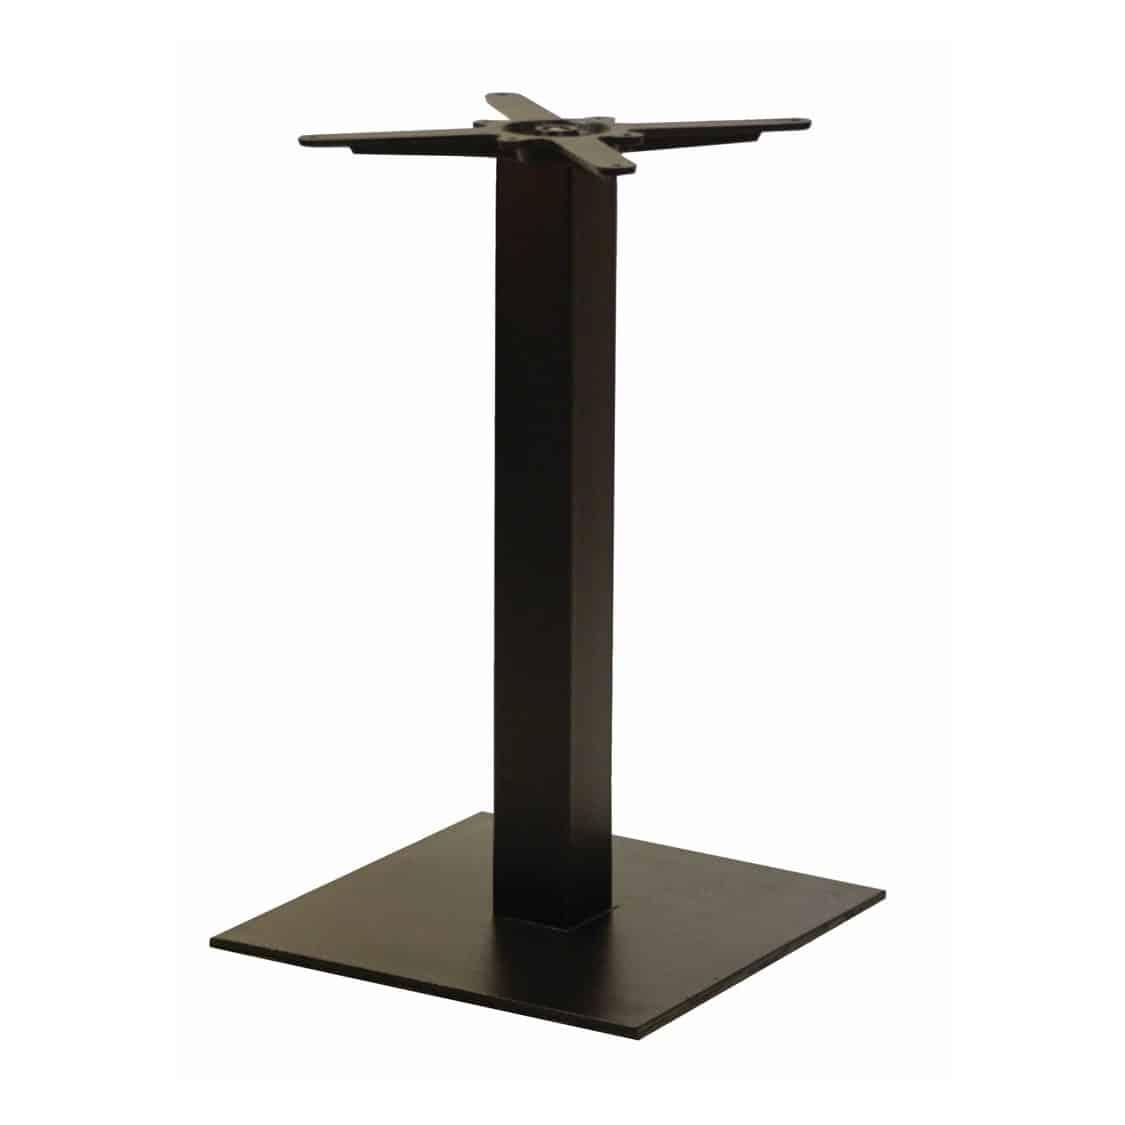 Forza square cast iron table base black